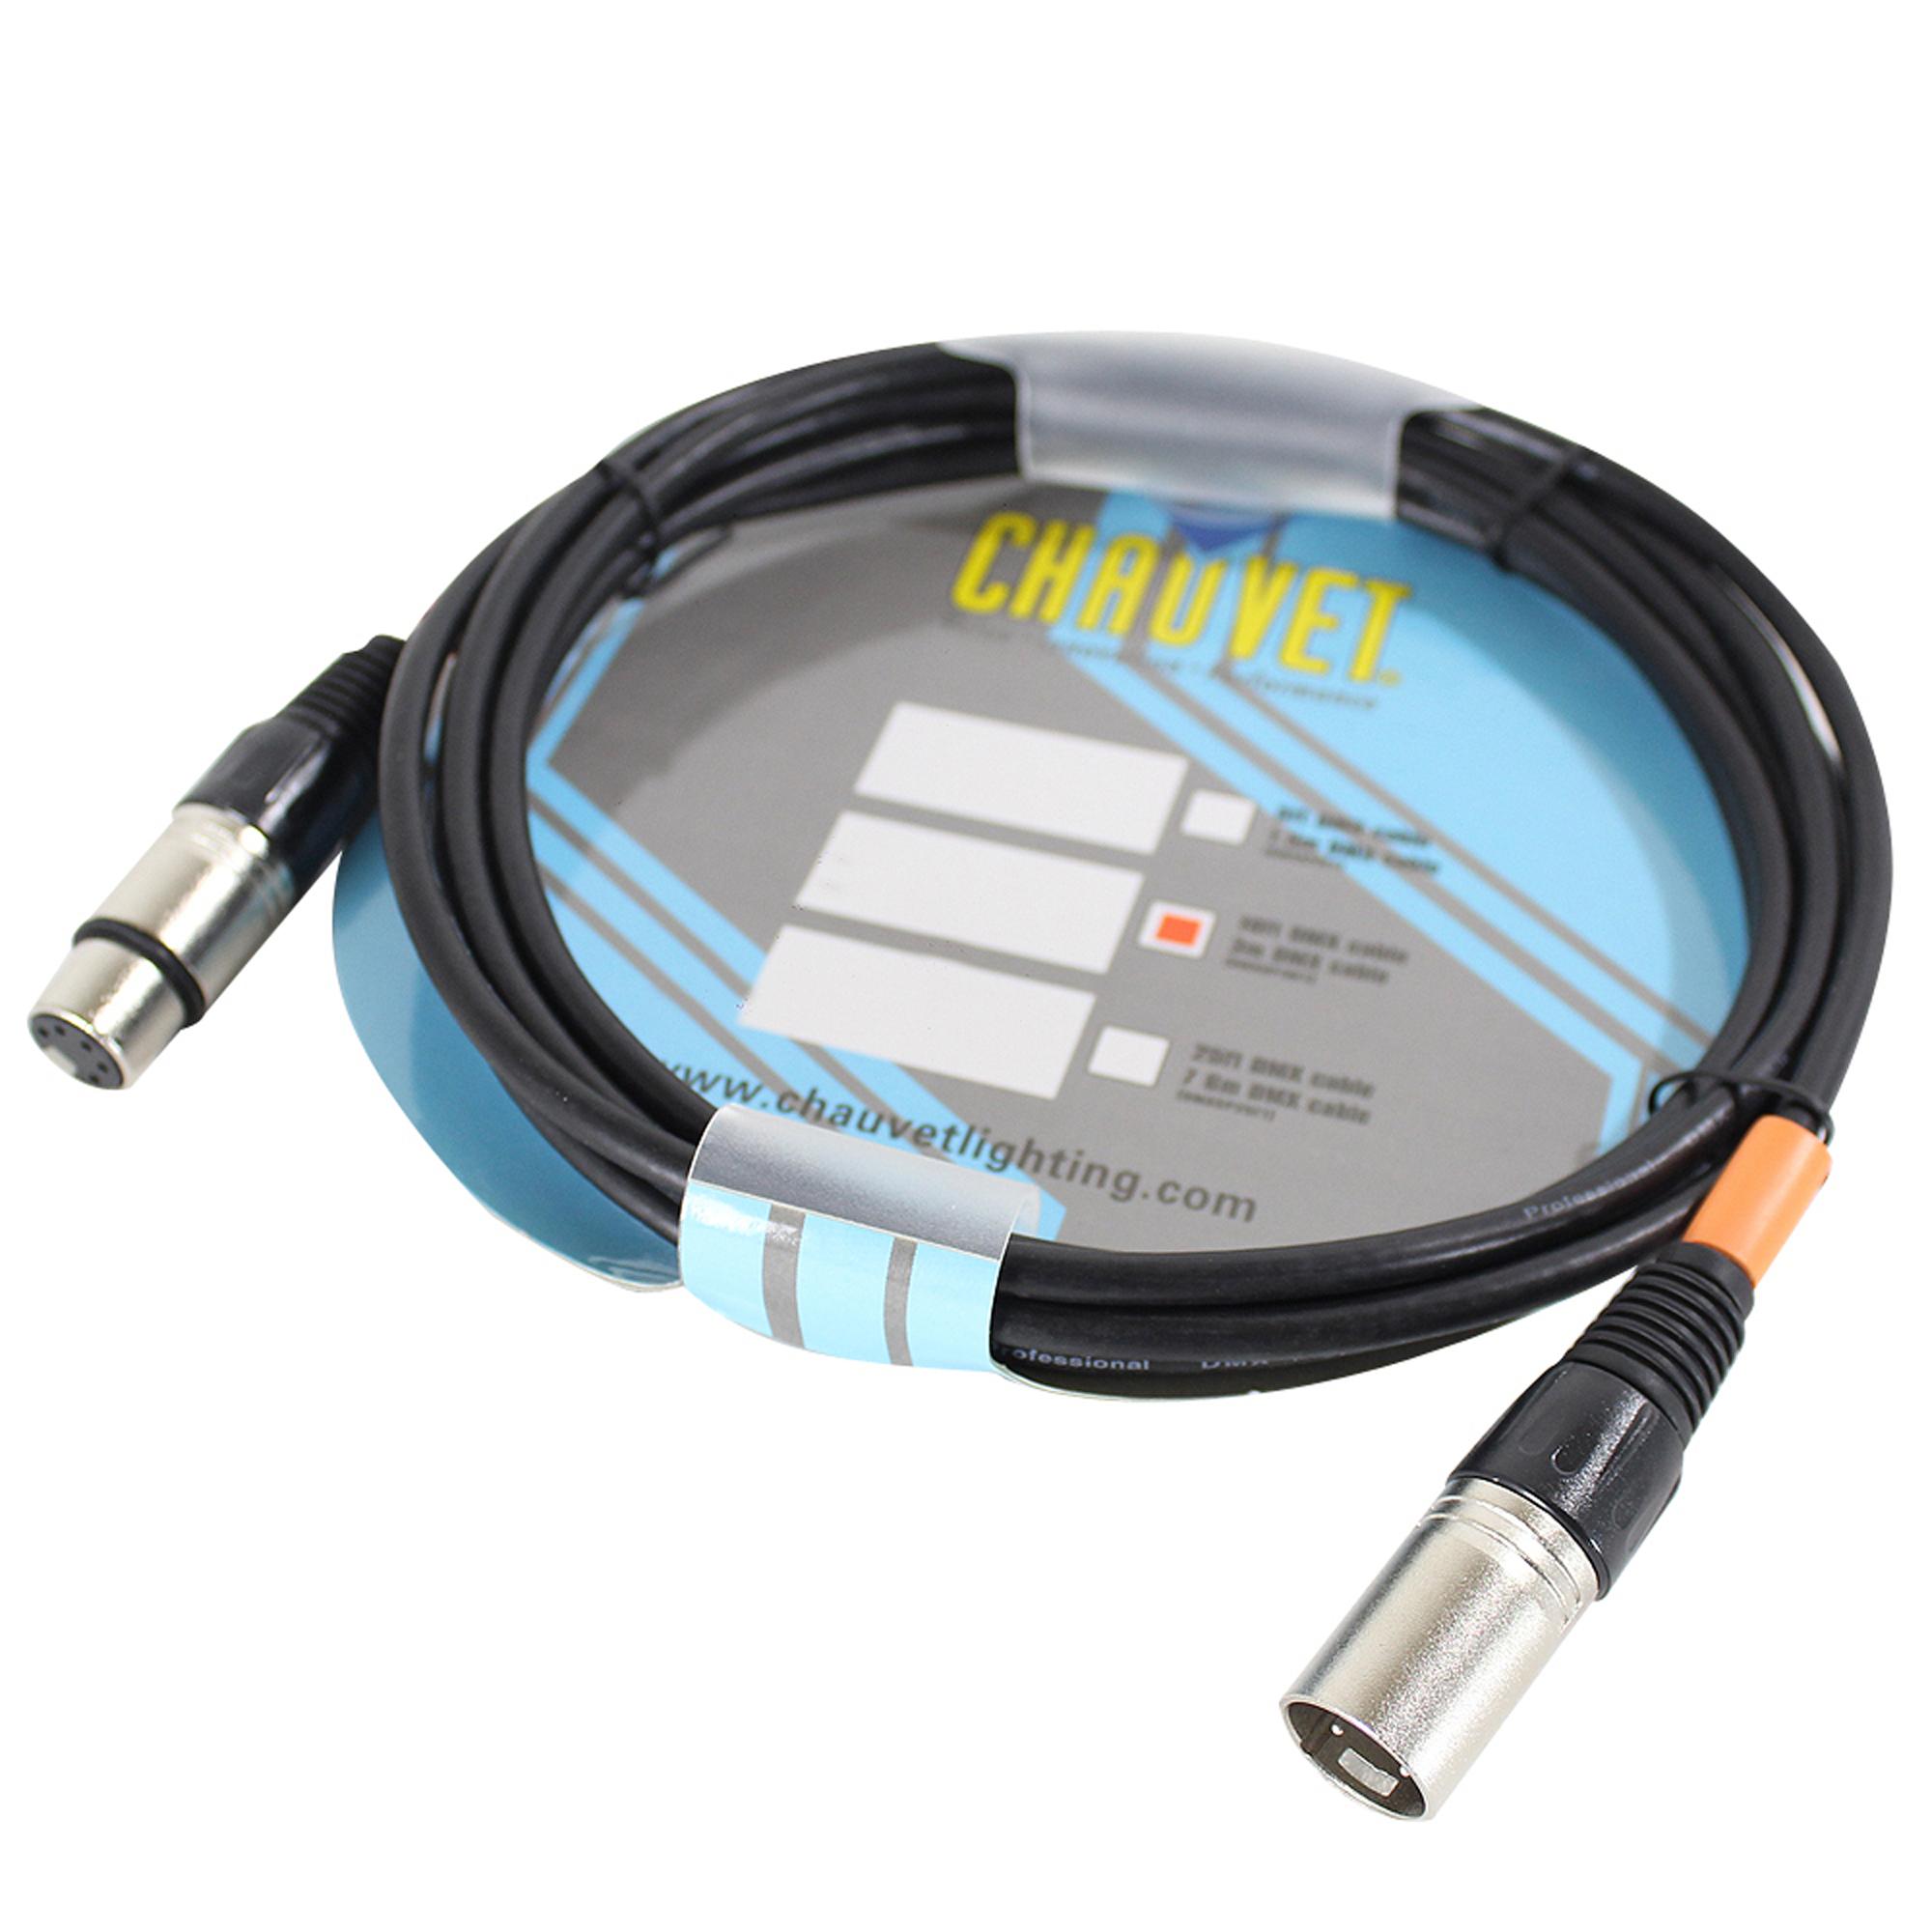 Chauvet DJ Male DMX 5-Pin to Female DMX 5-Pin Lighting Cable 3m